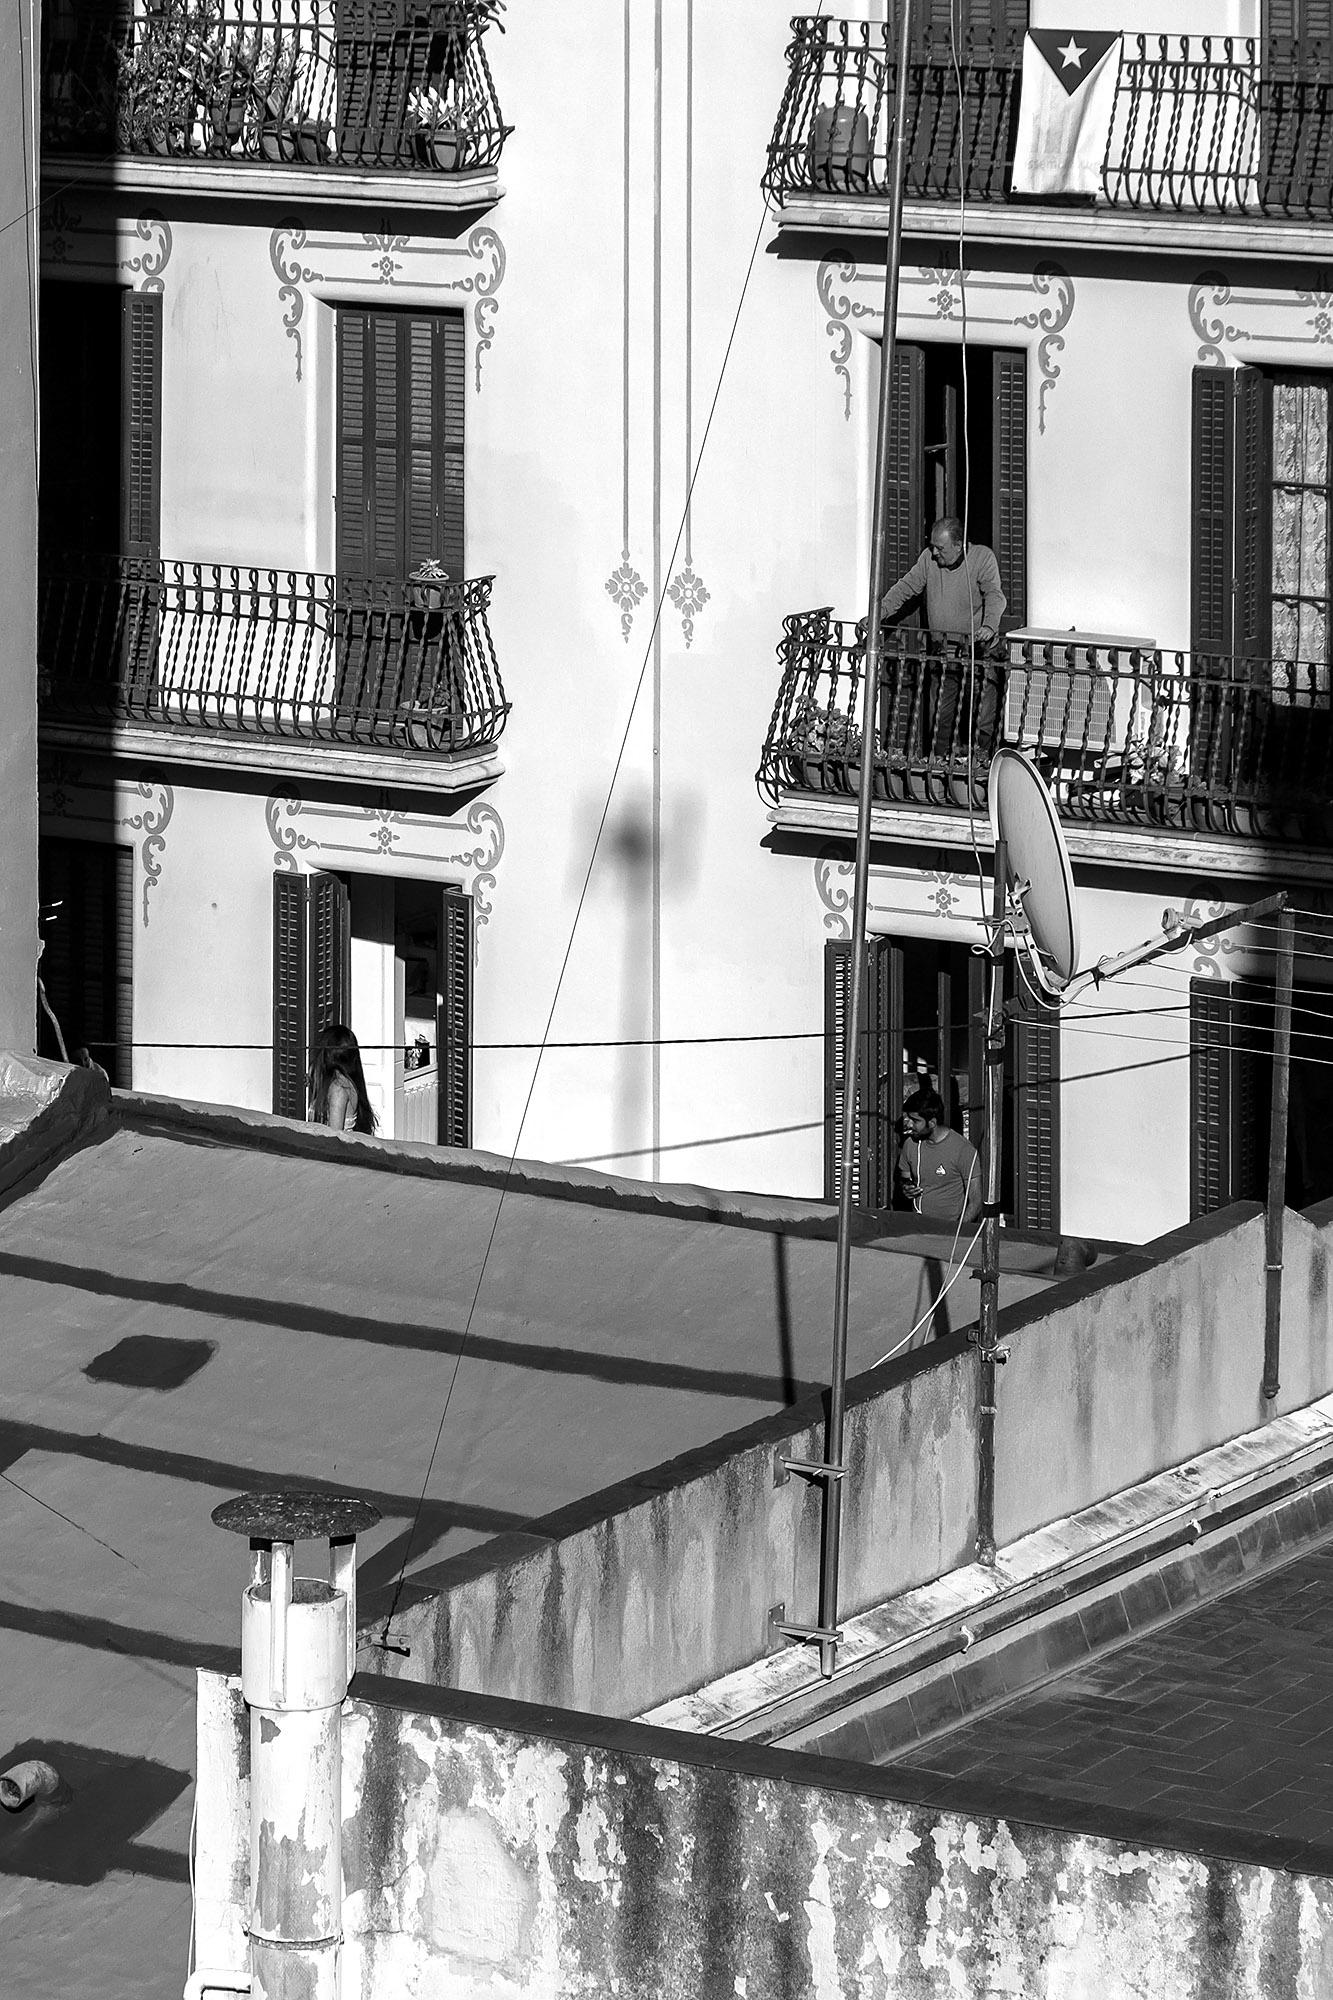 Lockdown Boredom: Neighbors on a balcony across the neighborhood.